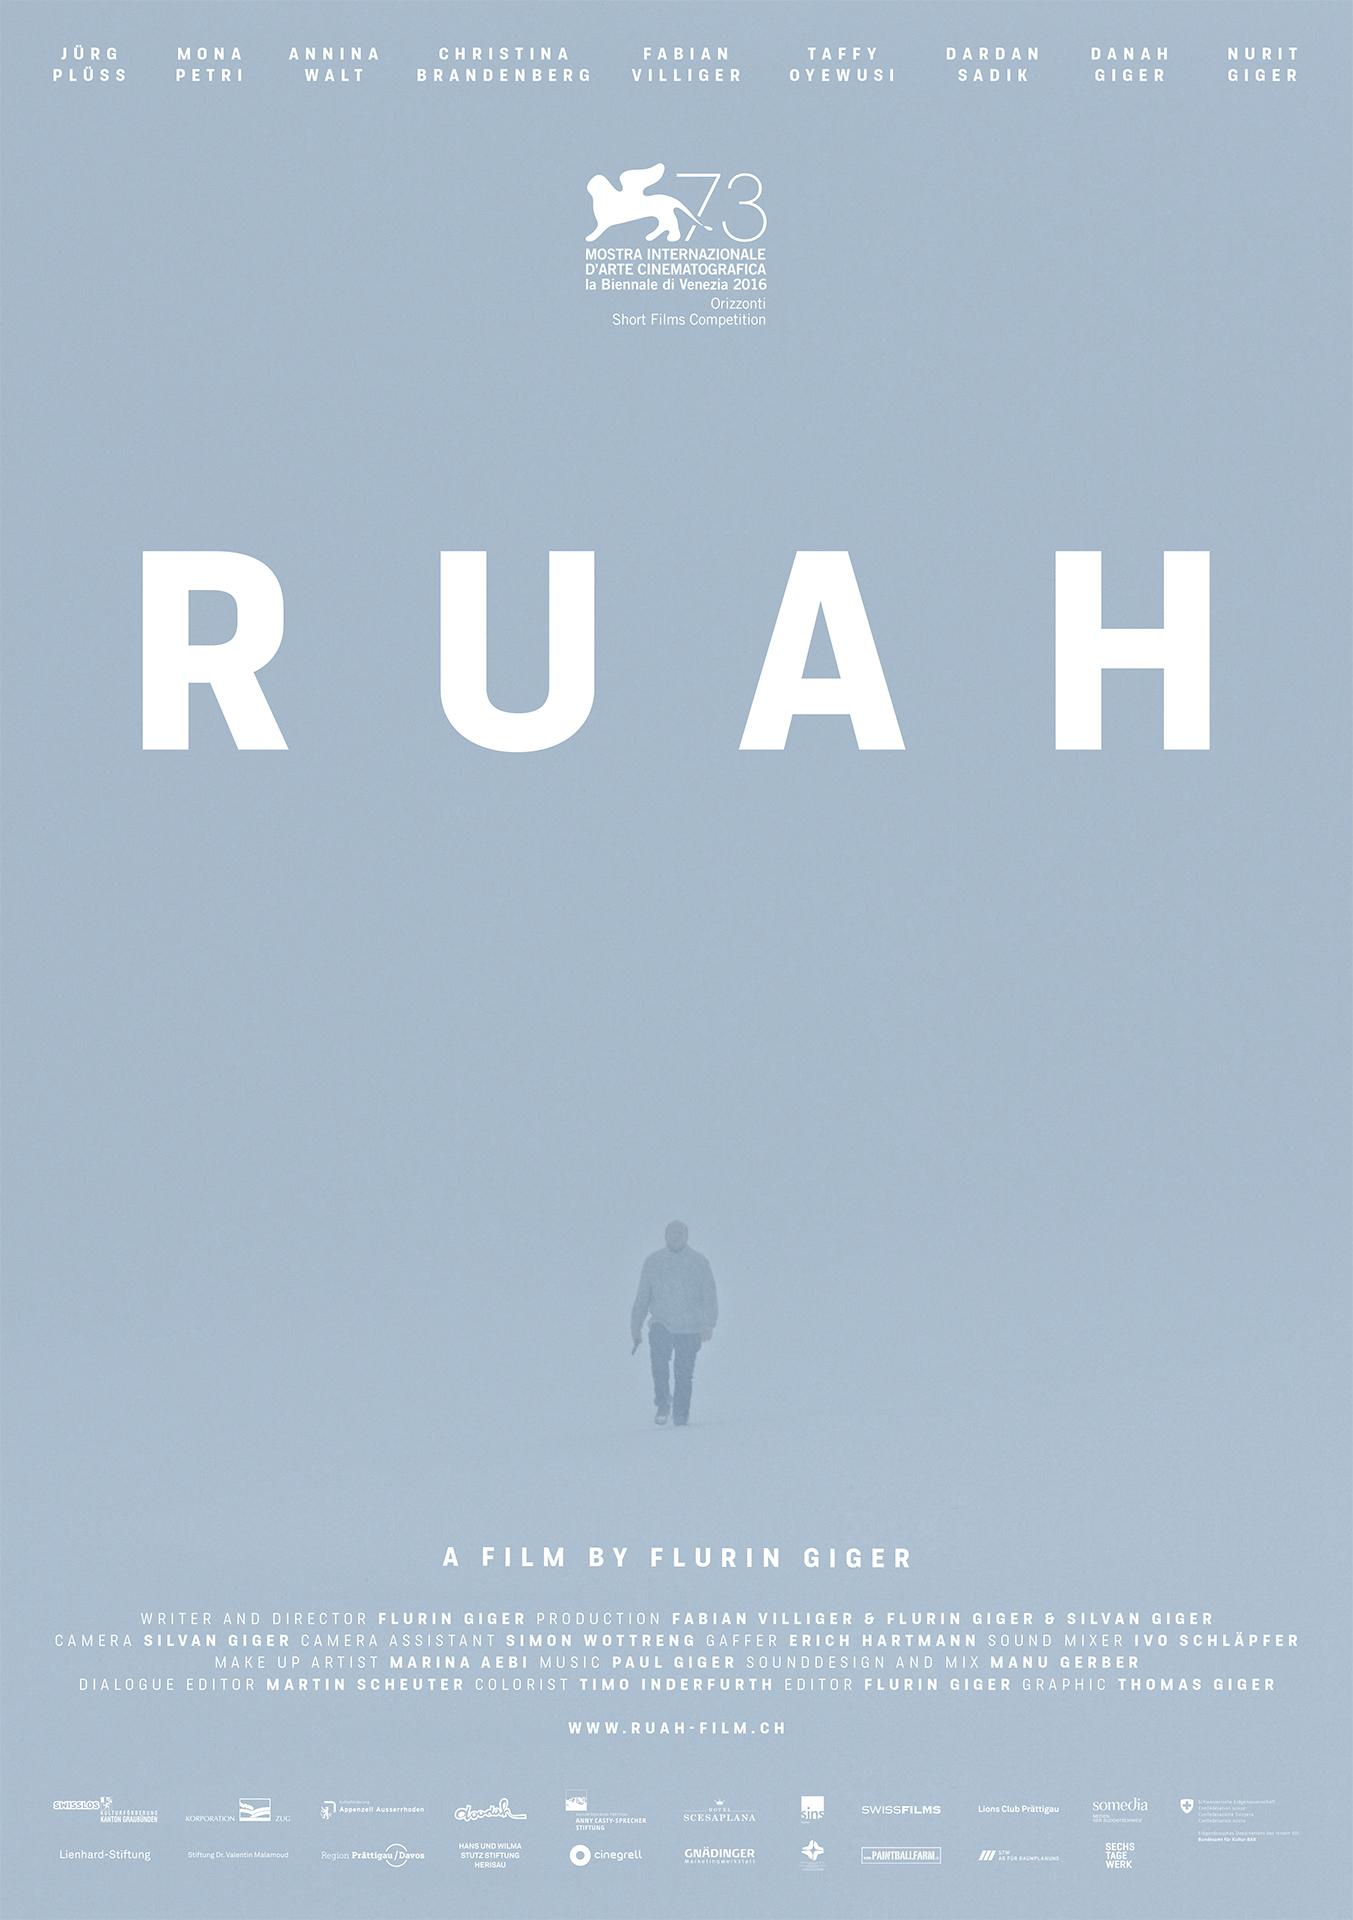 RUAH_venice_poster_sra3.jpg